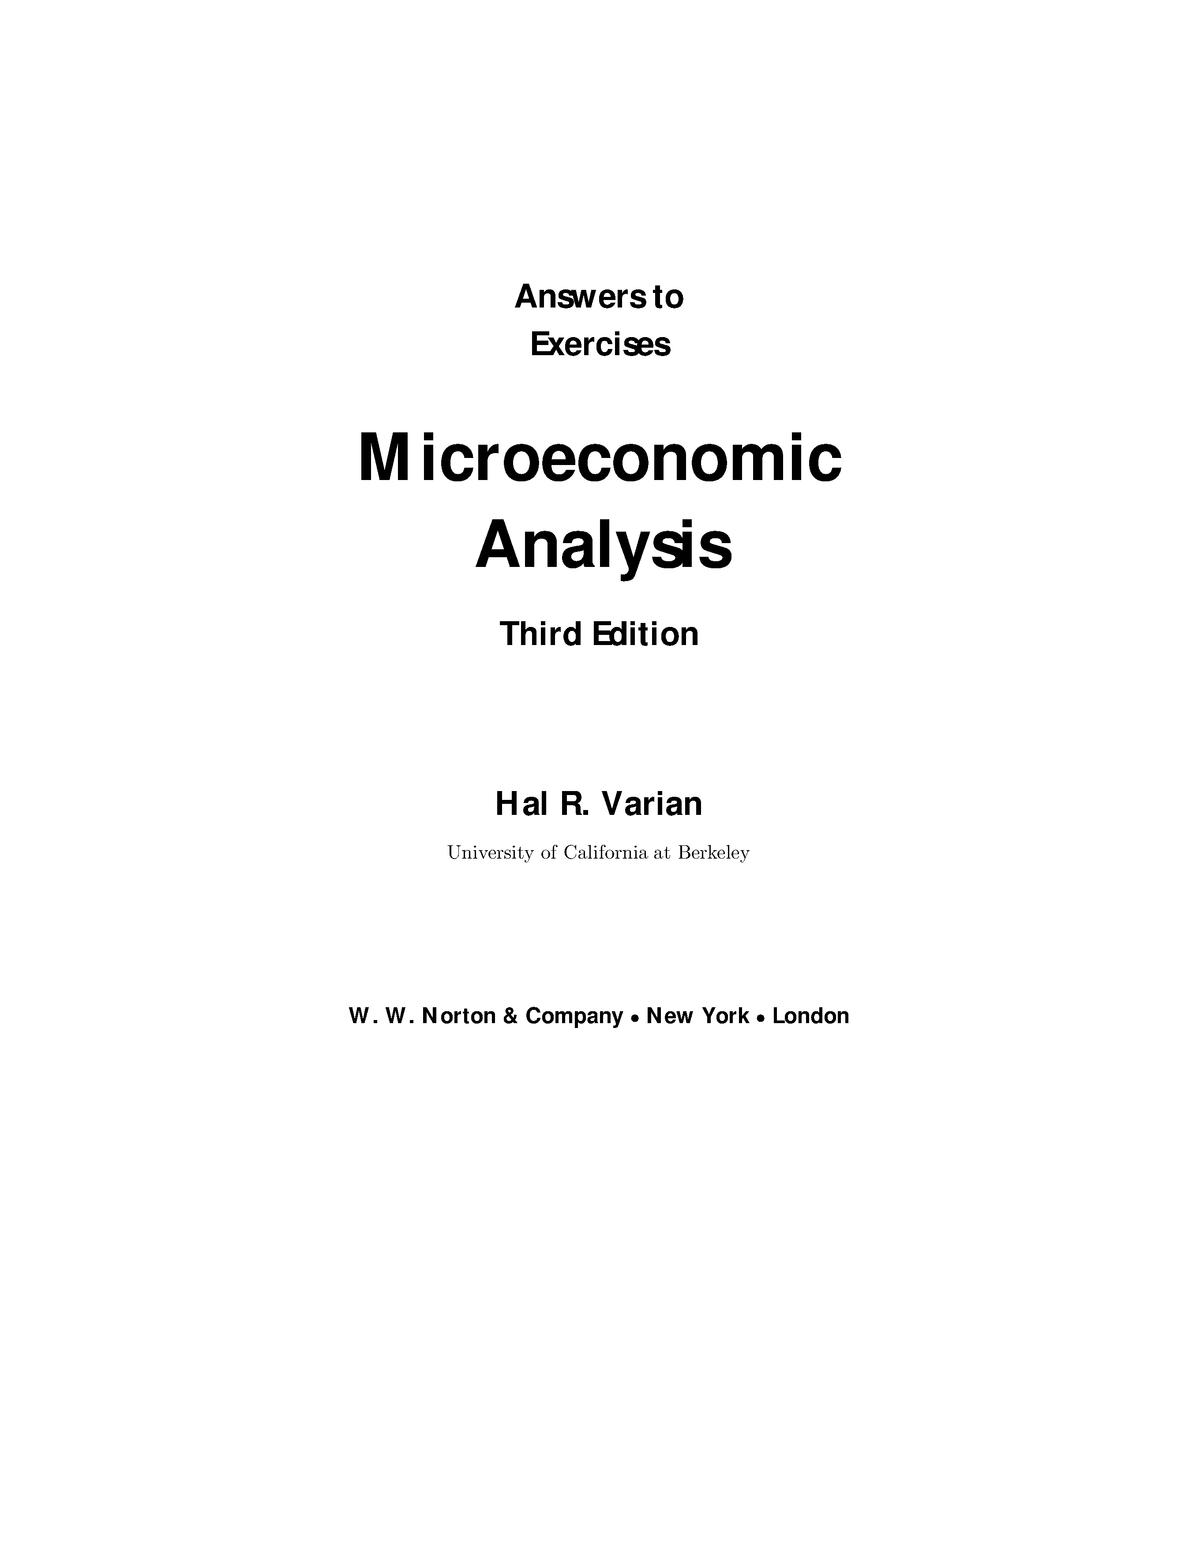 Varian Microeconomic Analysis  Solutions - ECON-289 - StuDocu